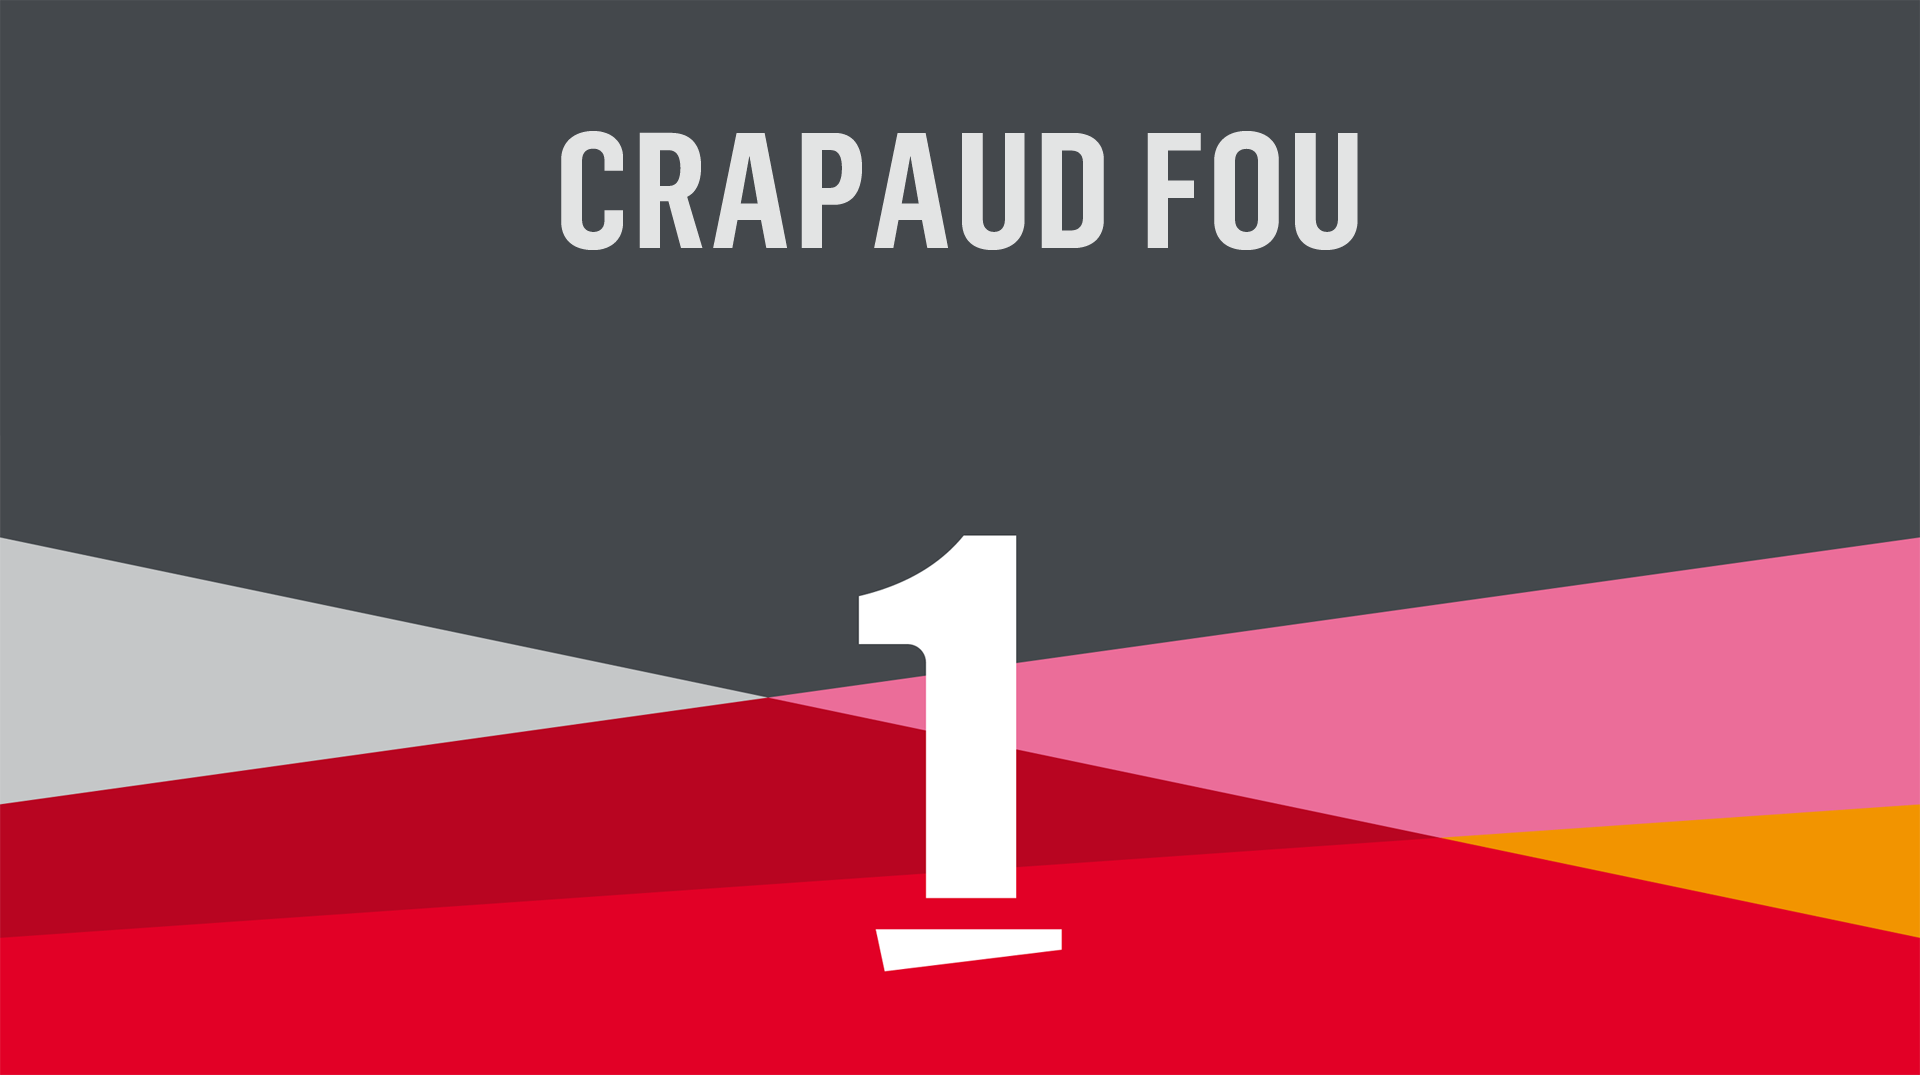 Logo Crapaud fou [RTS]